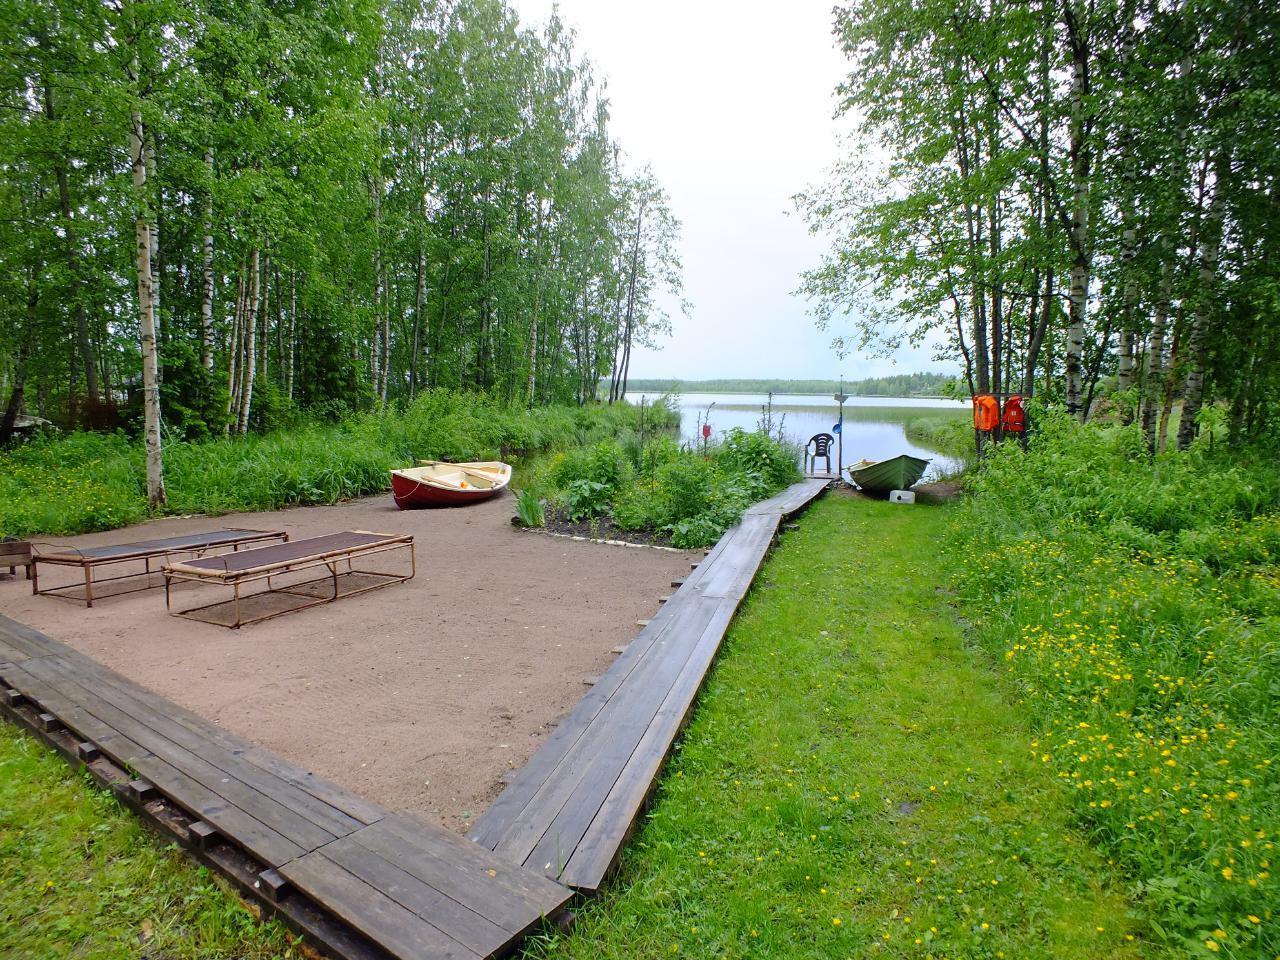 Ferienhaus - Mökki mit Sauna direkt am See  in Mouhijärvi-Sastamala (1707905), Mouhijärvi, , Westfinnland, Finnland, Bild 10